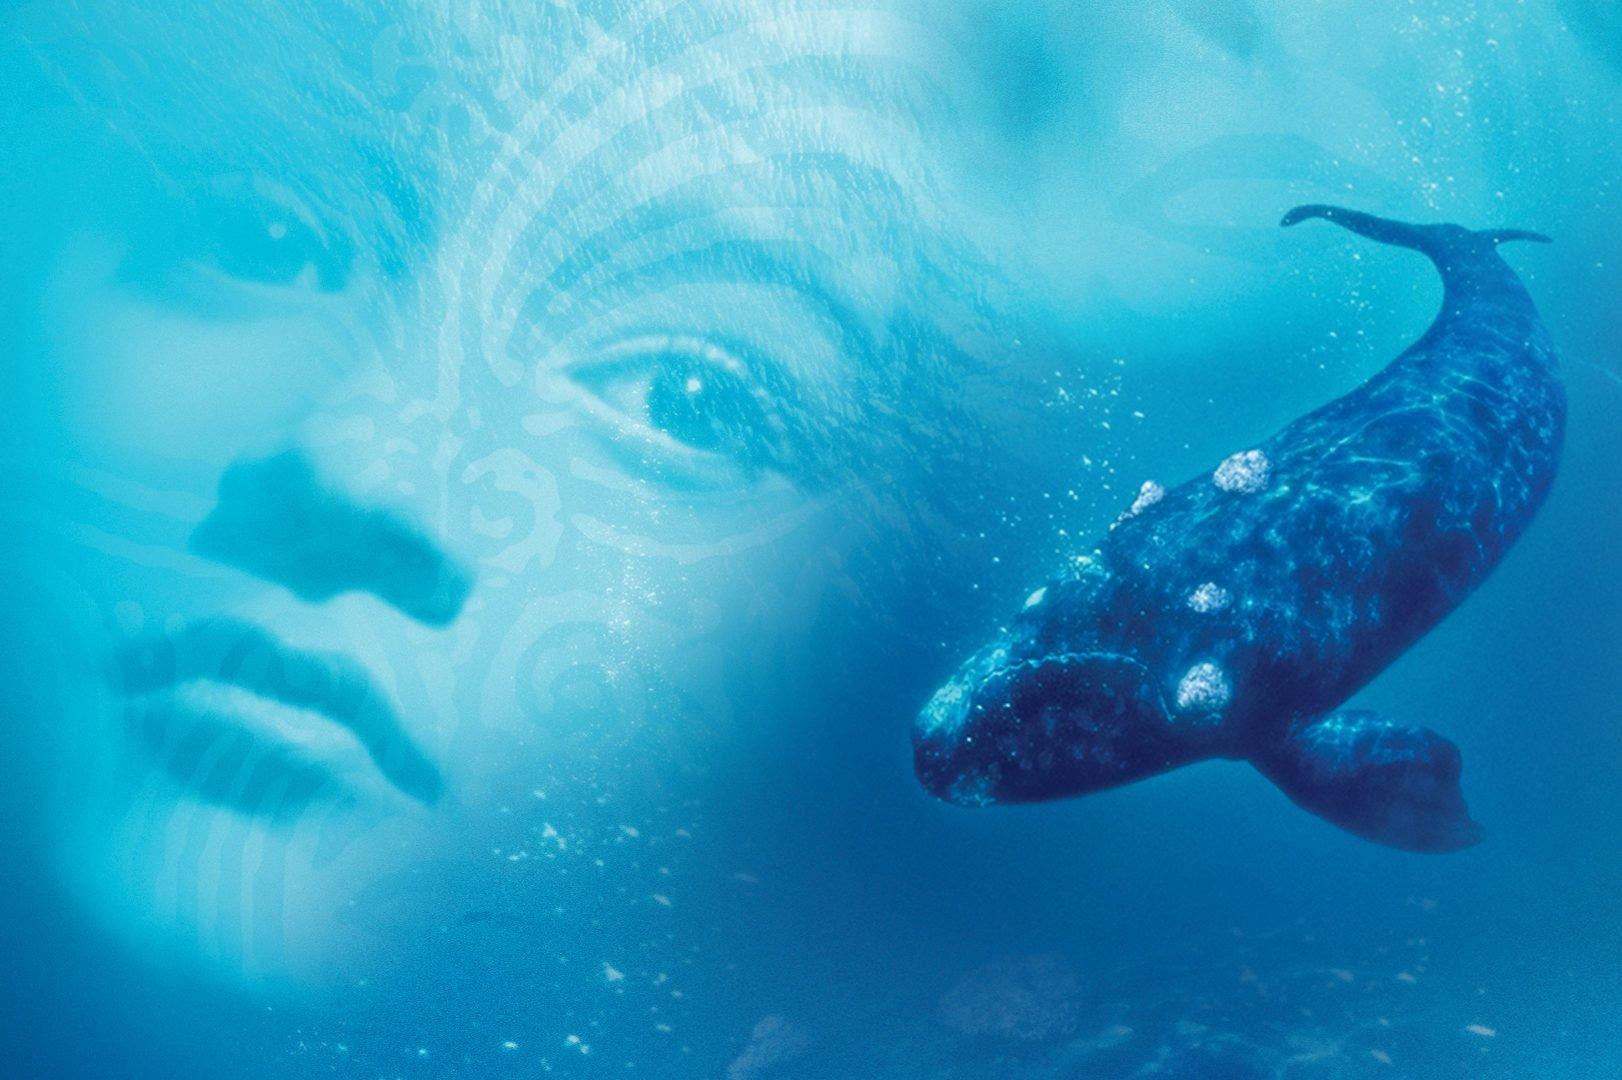 Whale Rider (2020)